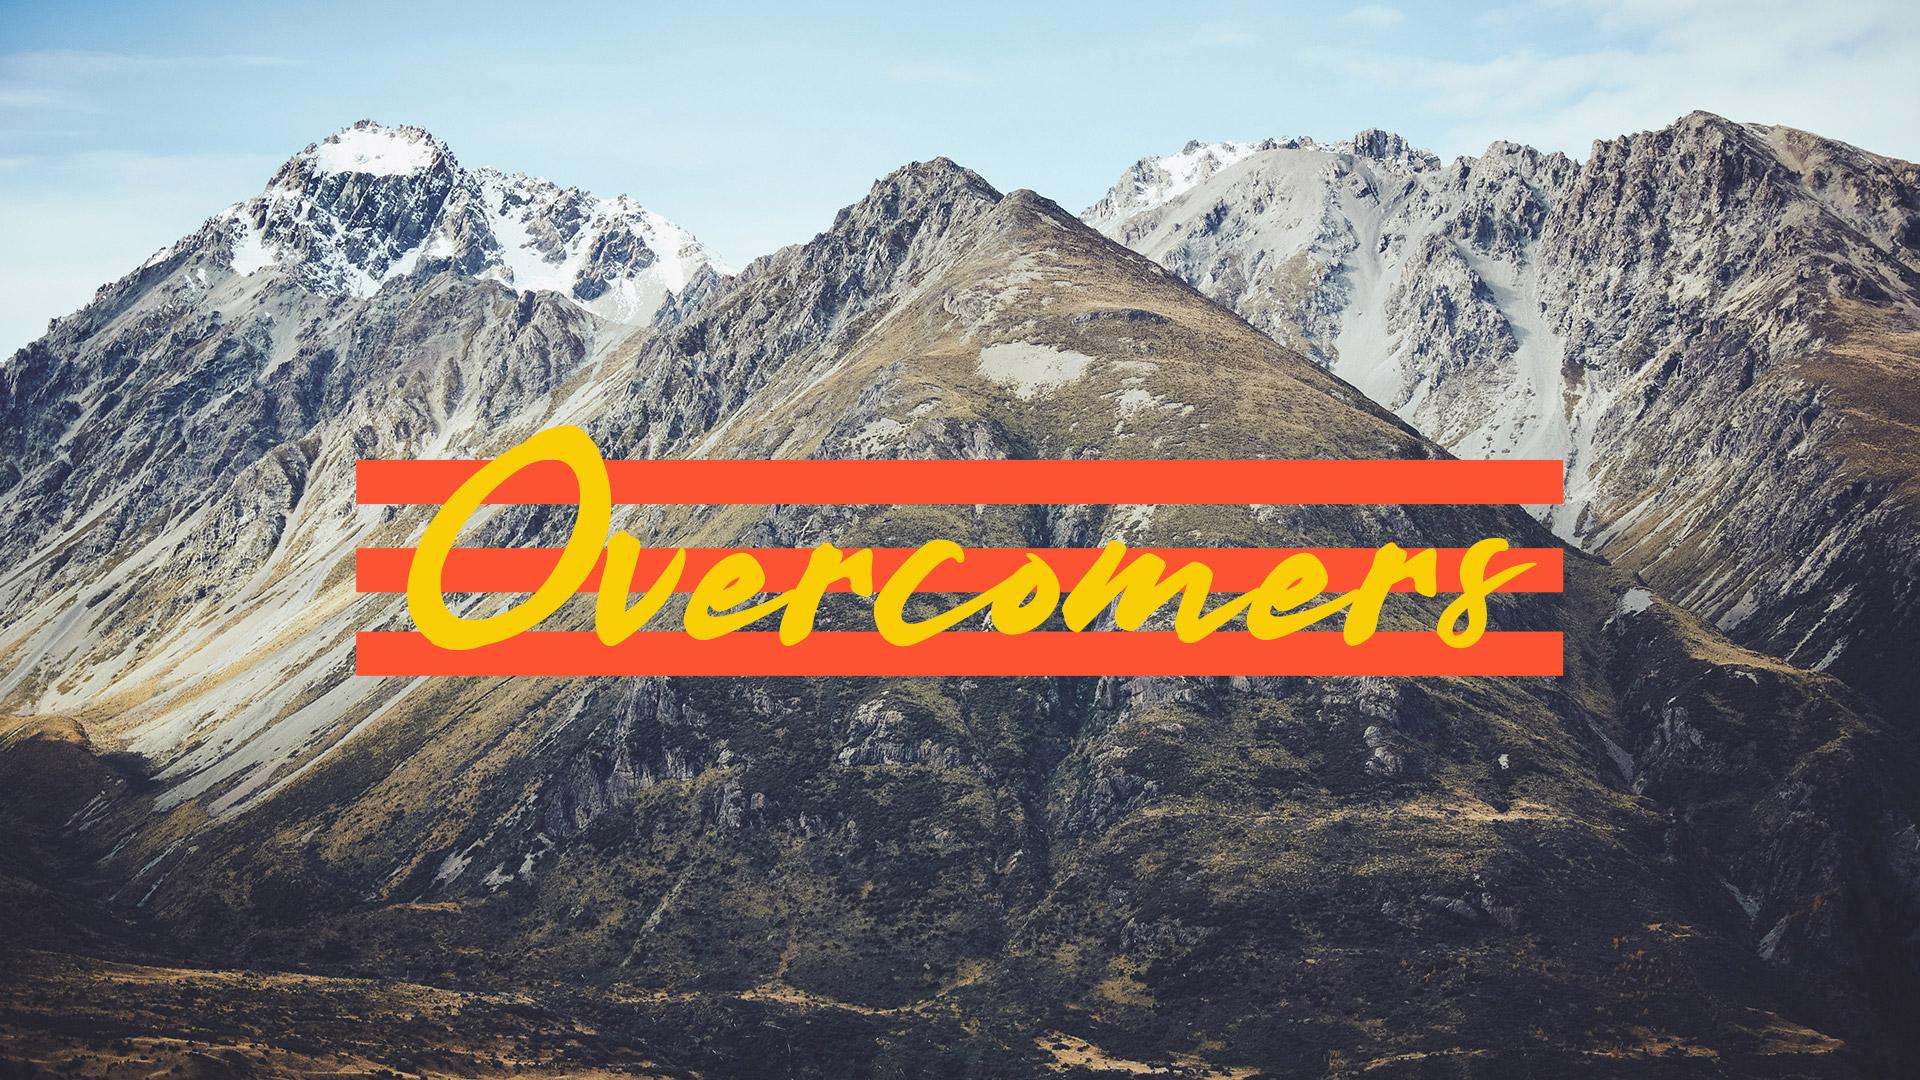 overcomers(1920x1080-blank)sm.jpg